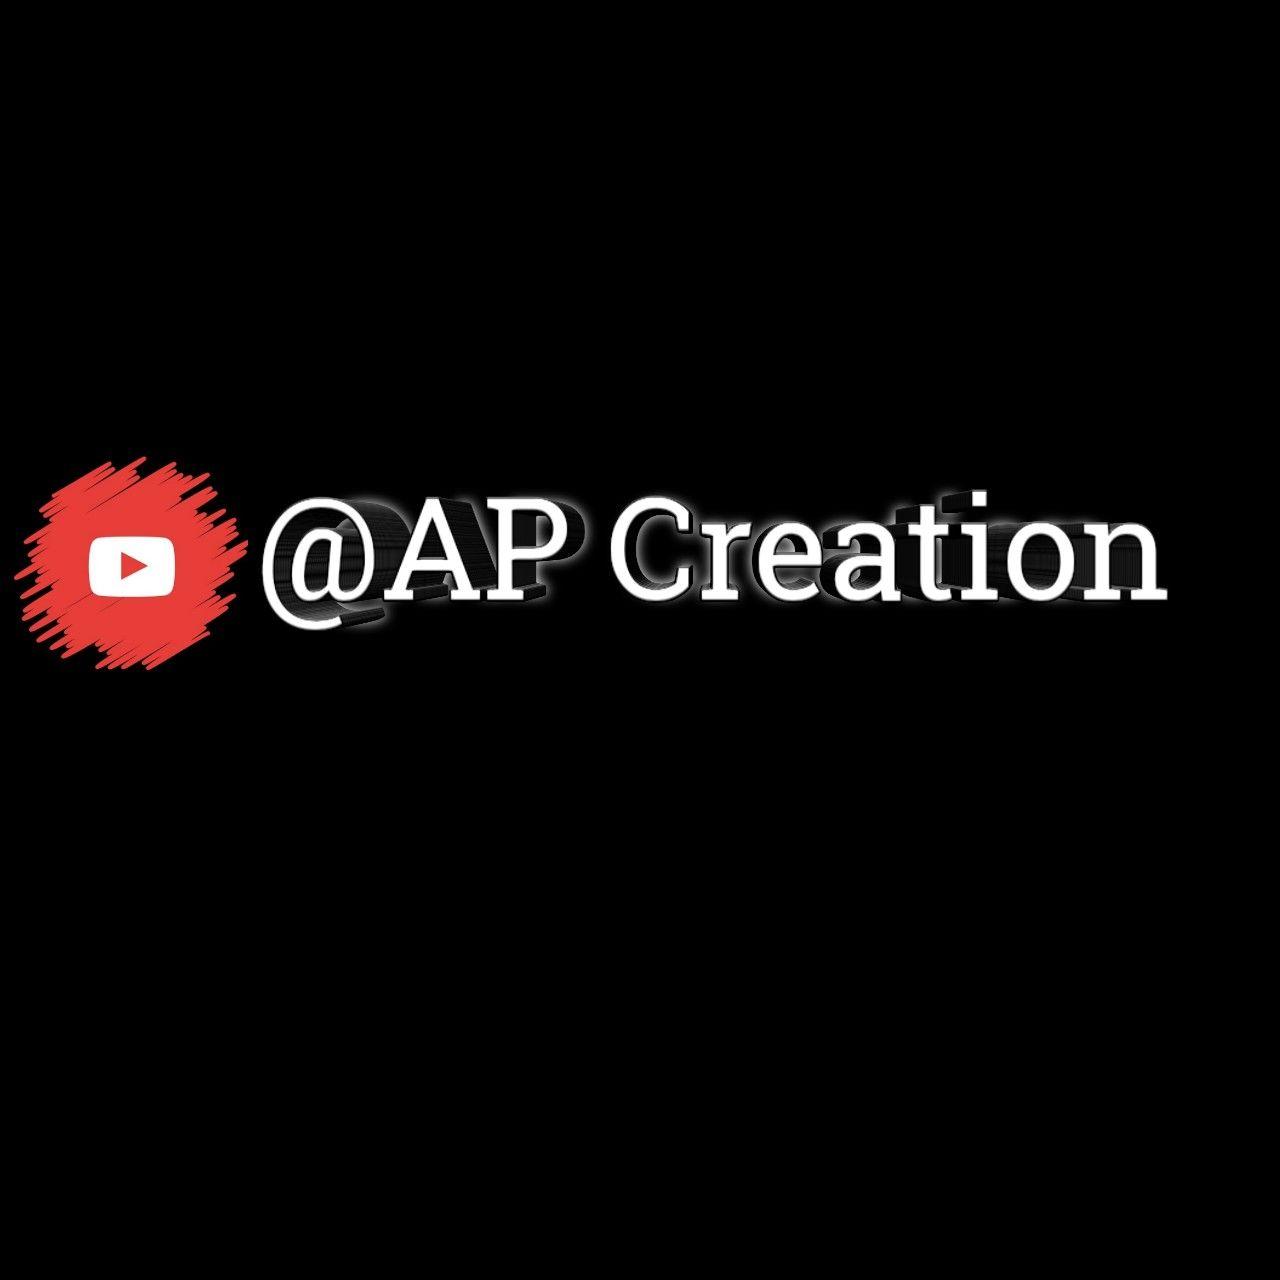 Ap Creation Png Picsart Editing Picsart Incoming Call Screenshot Vehicle Logos